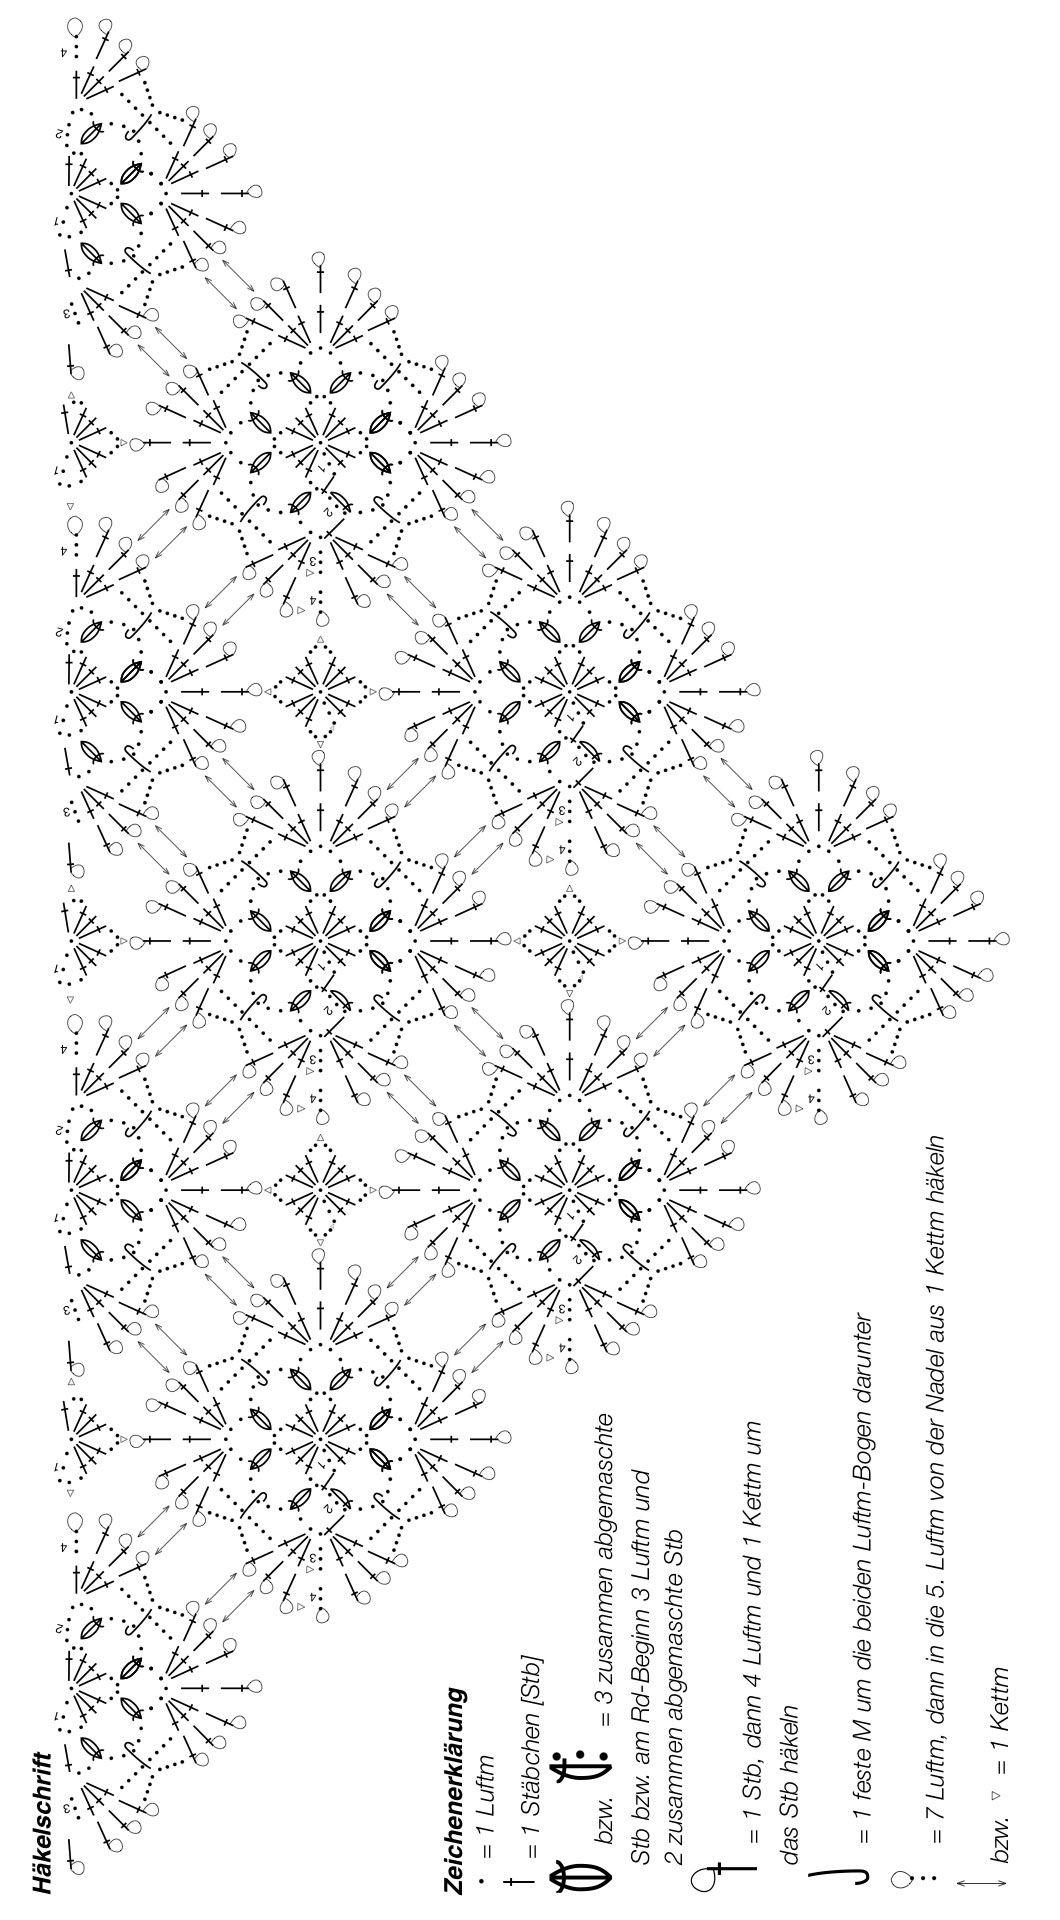 Feines gehäkeltes Dreieckstuch | Pinterest | Dreieckstuch stricken ...